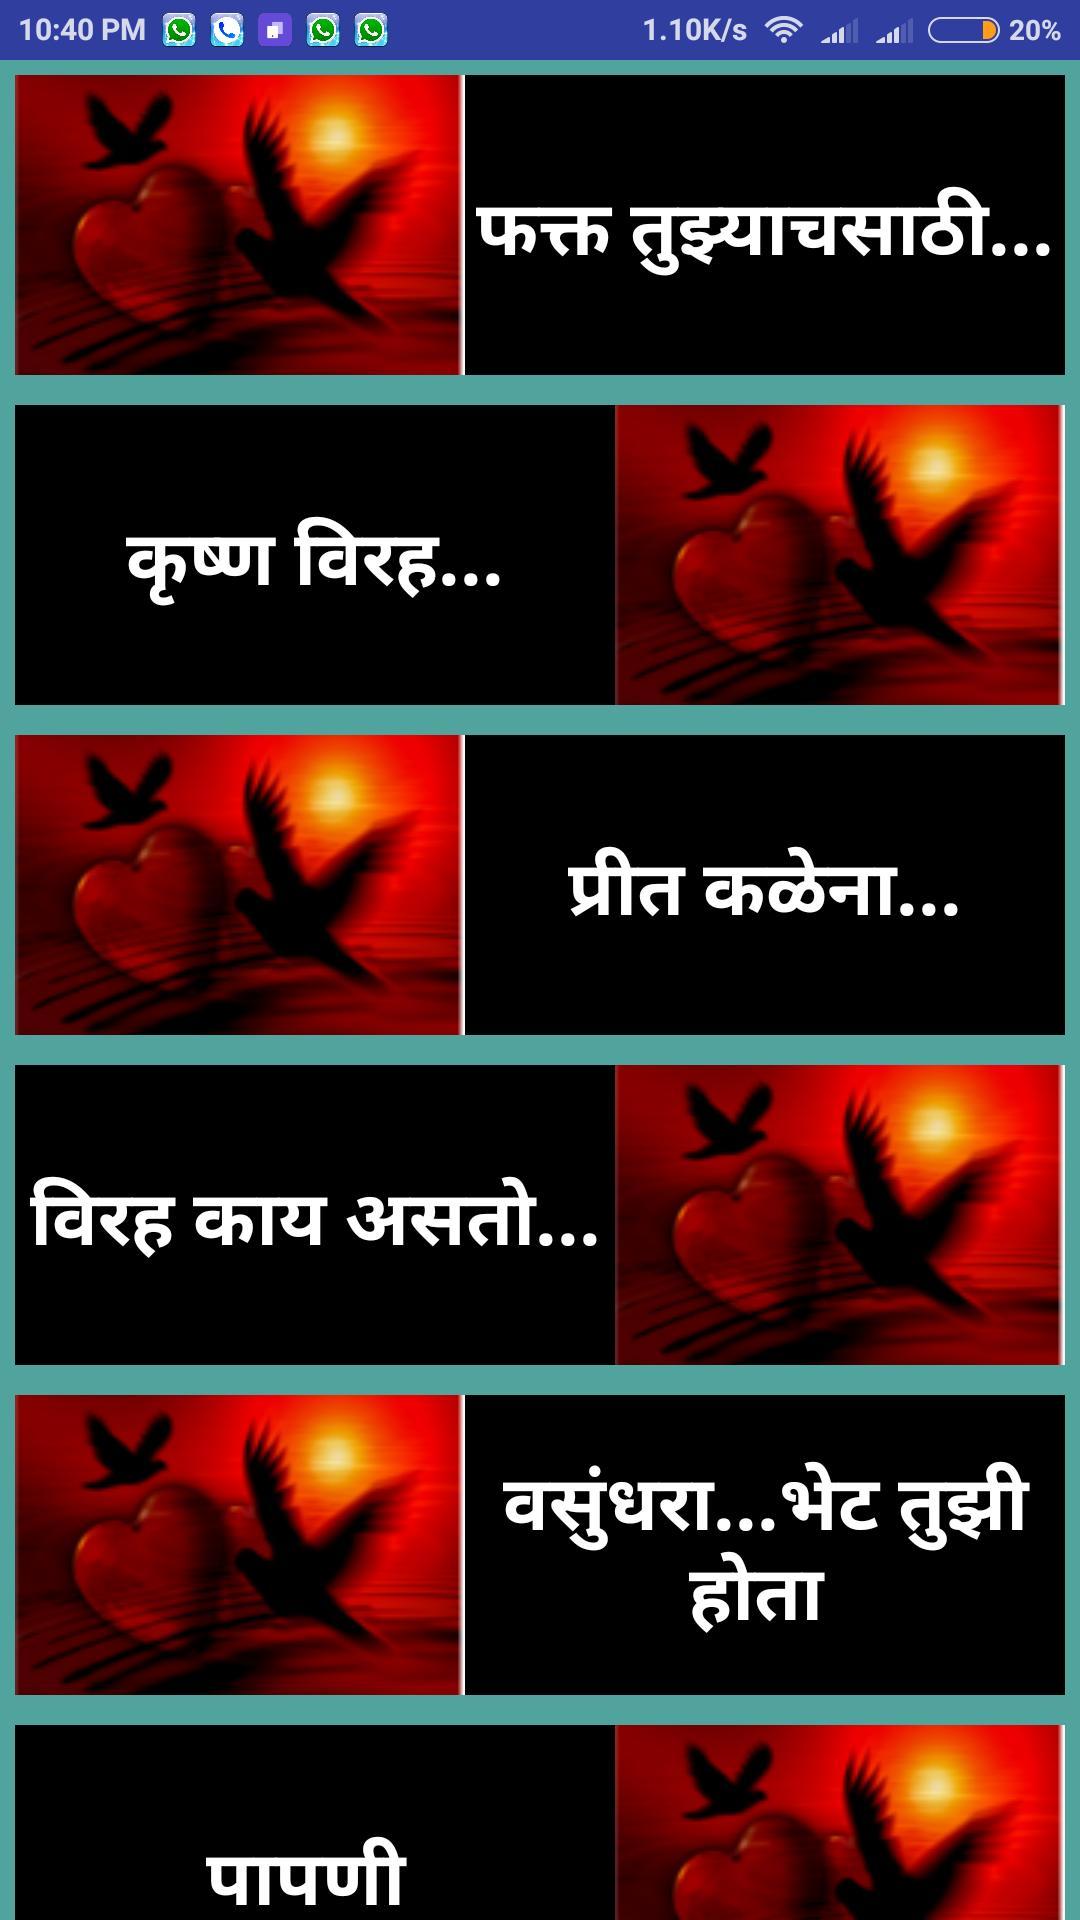 marathi kavita 💖| मराठी कविता for Android - APK